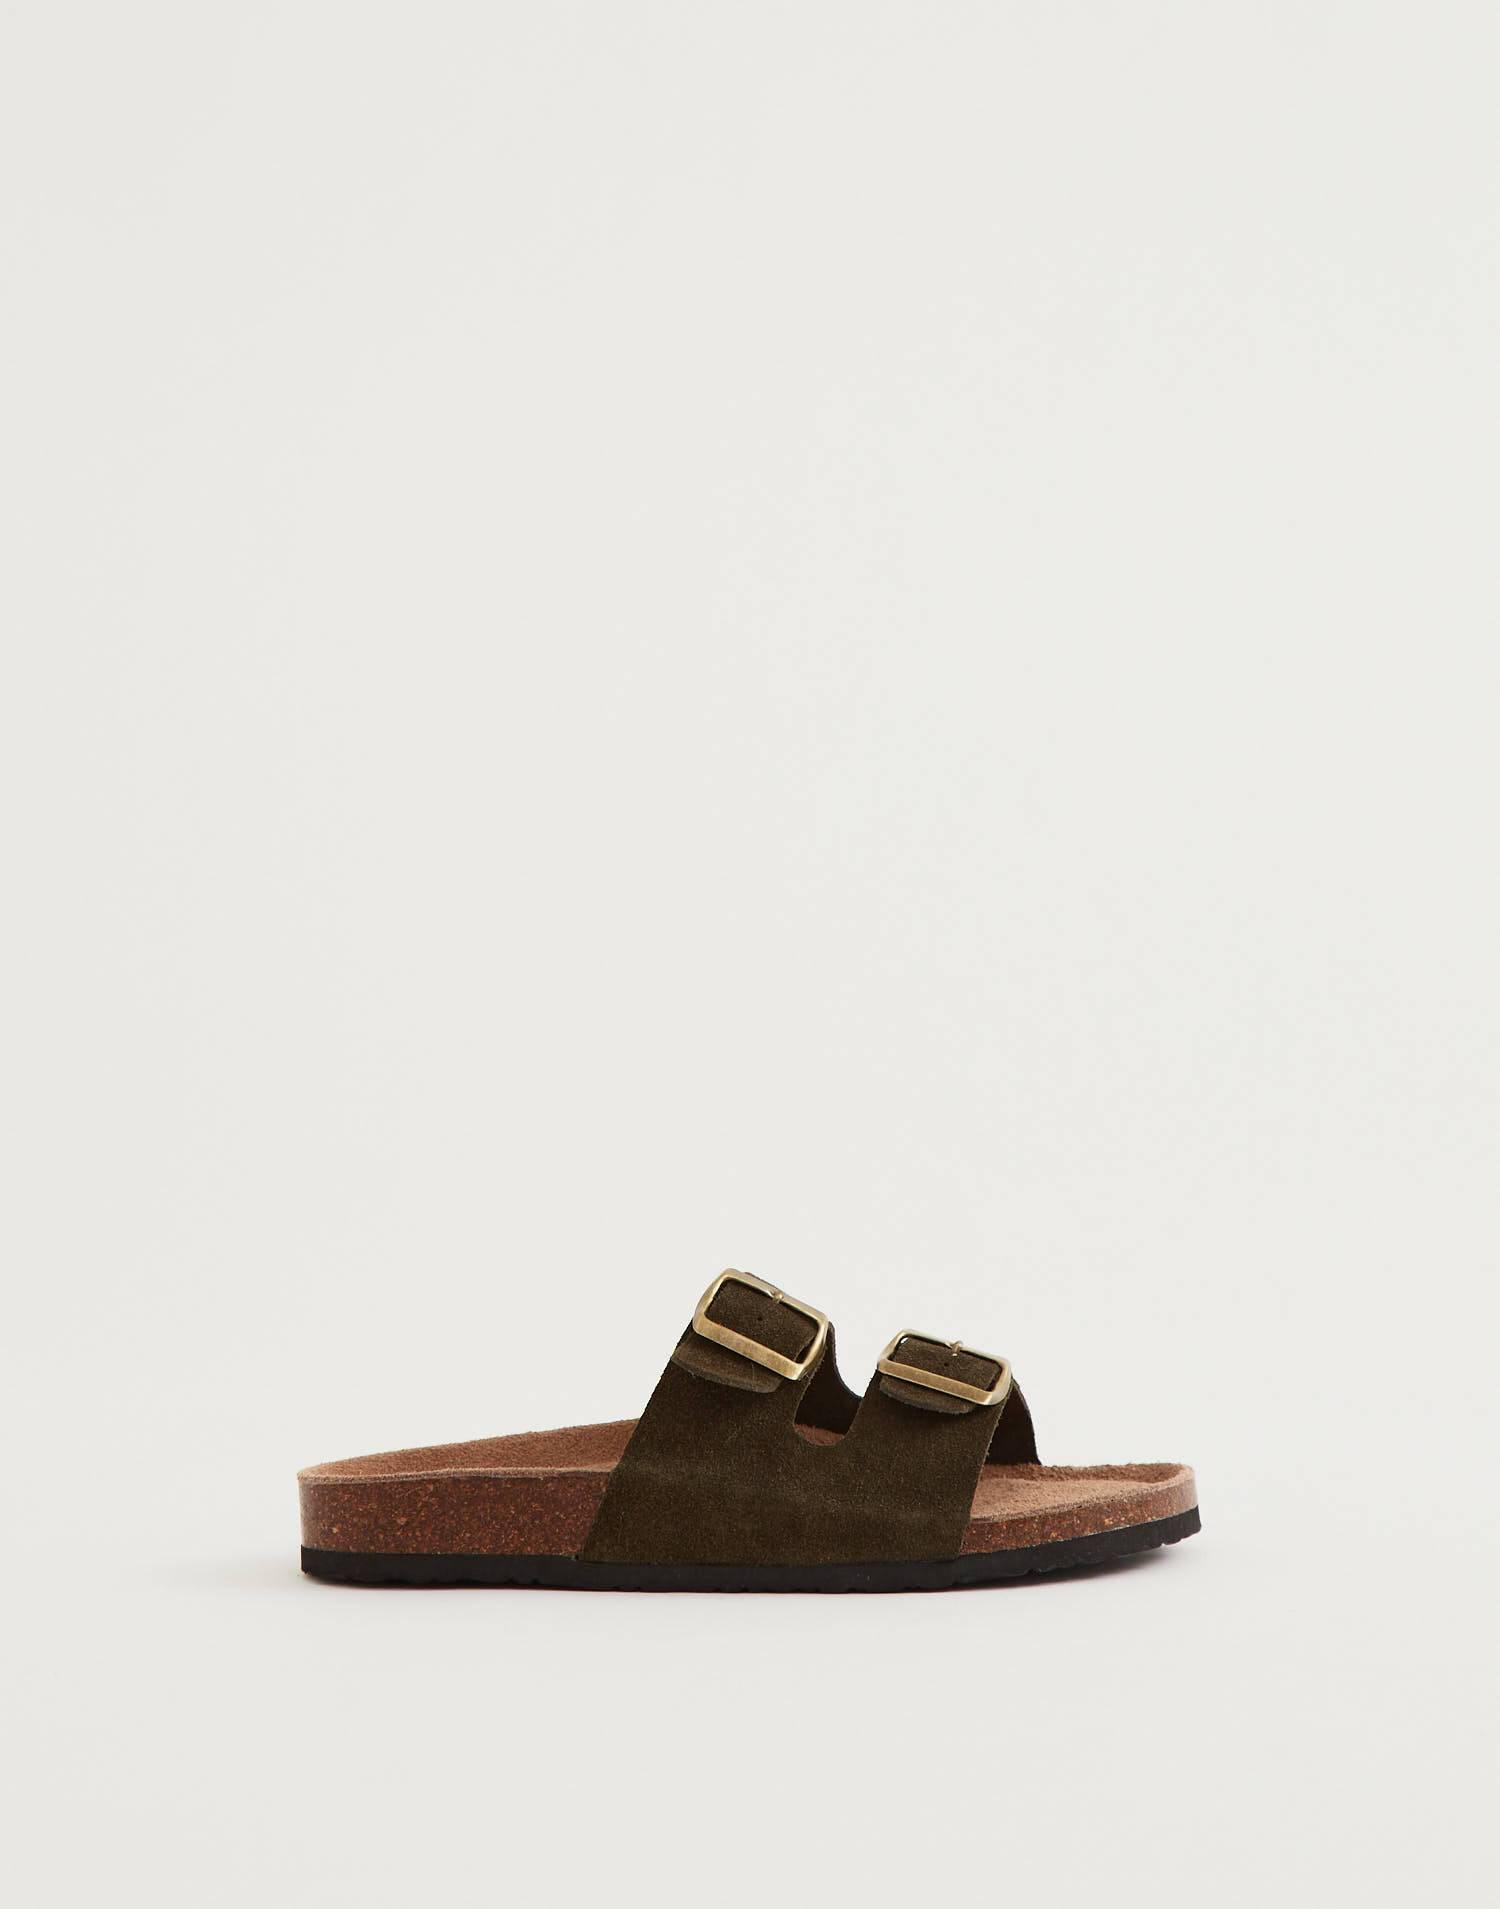 ergonomic sandal